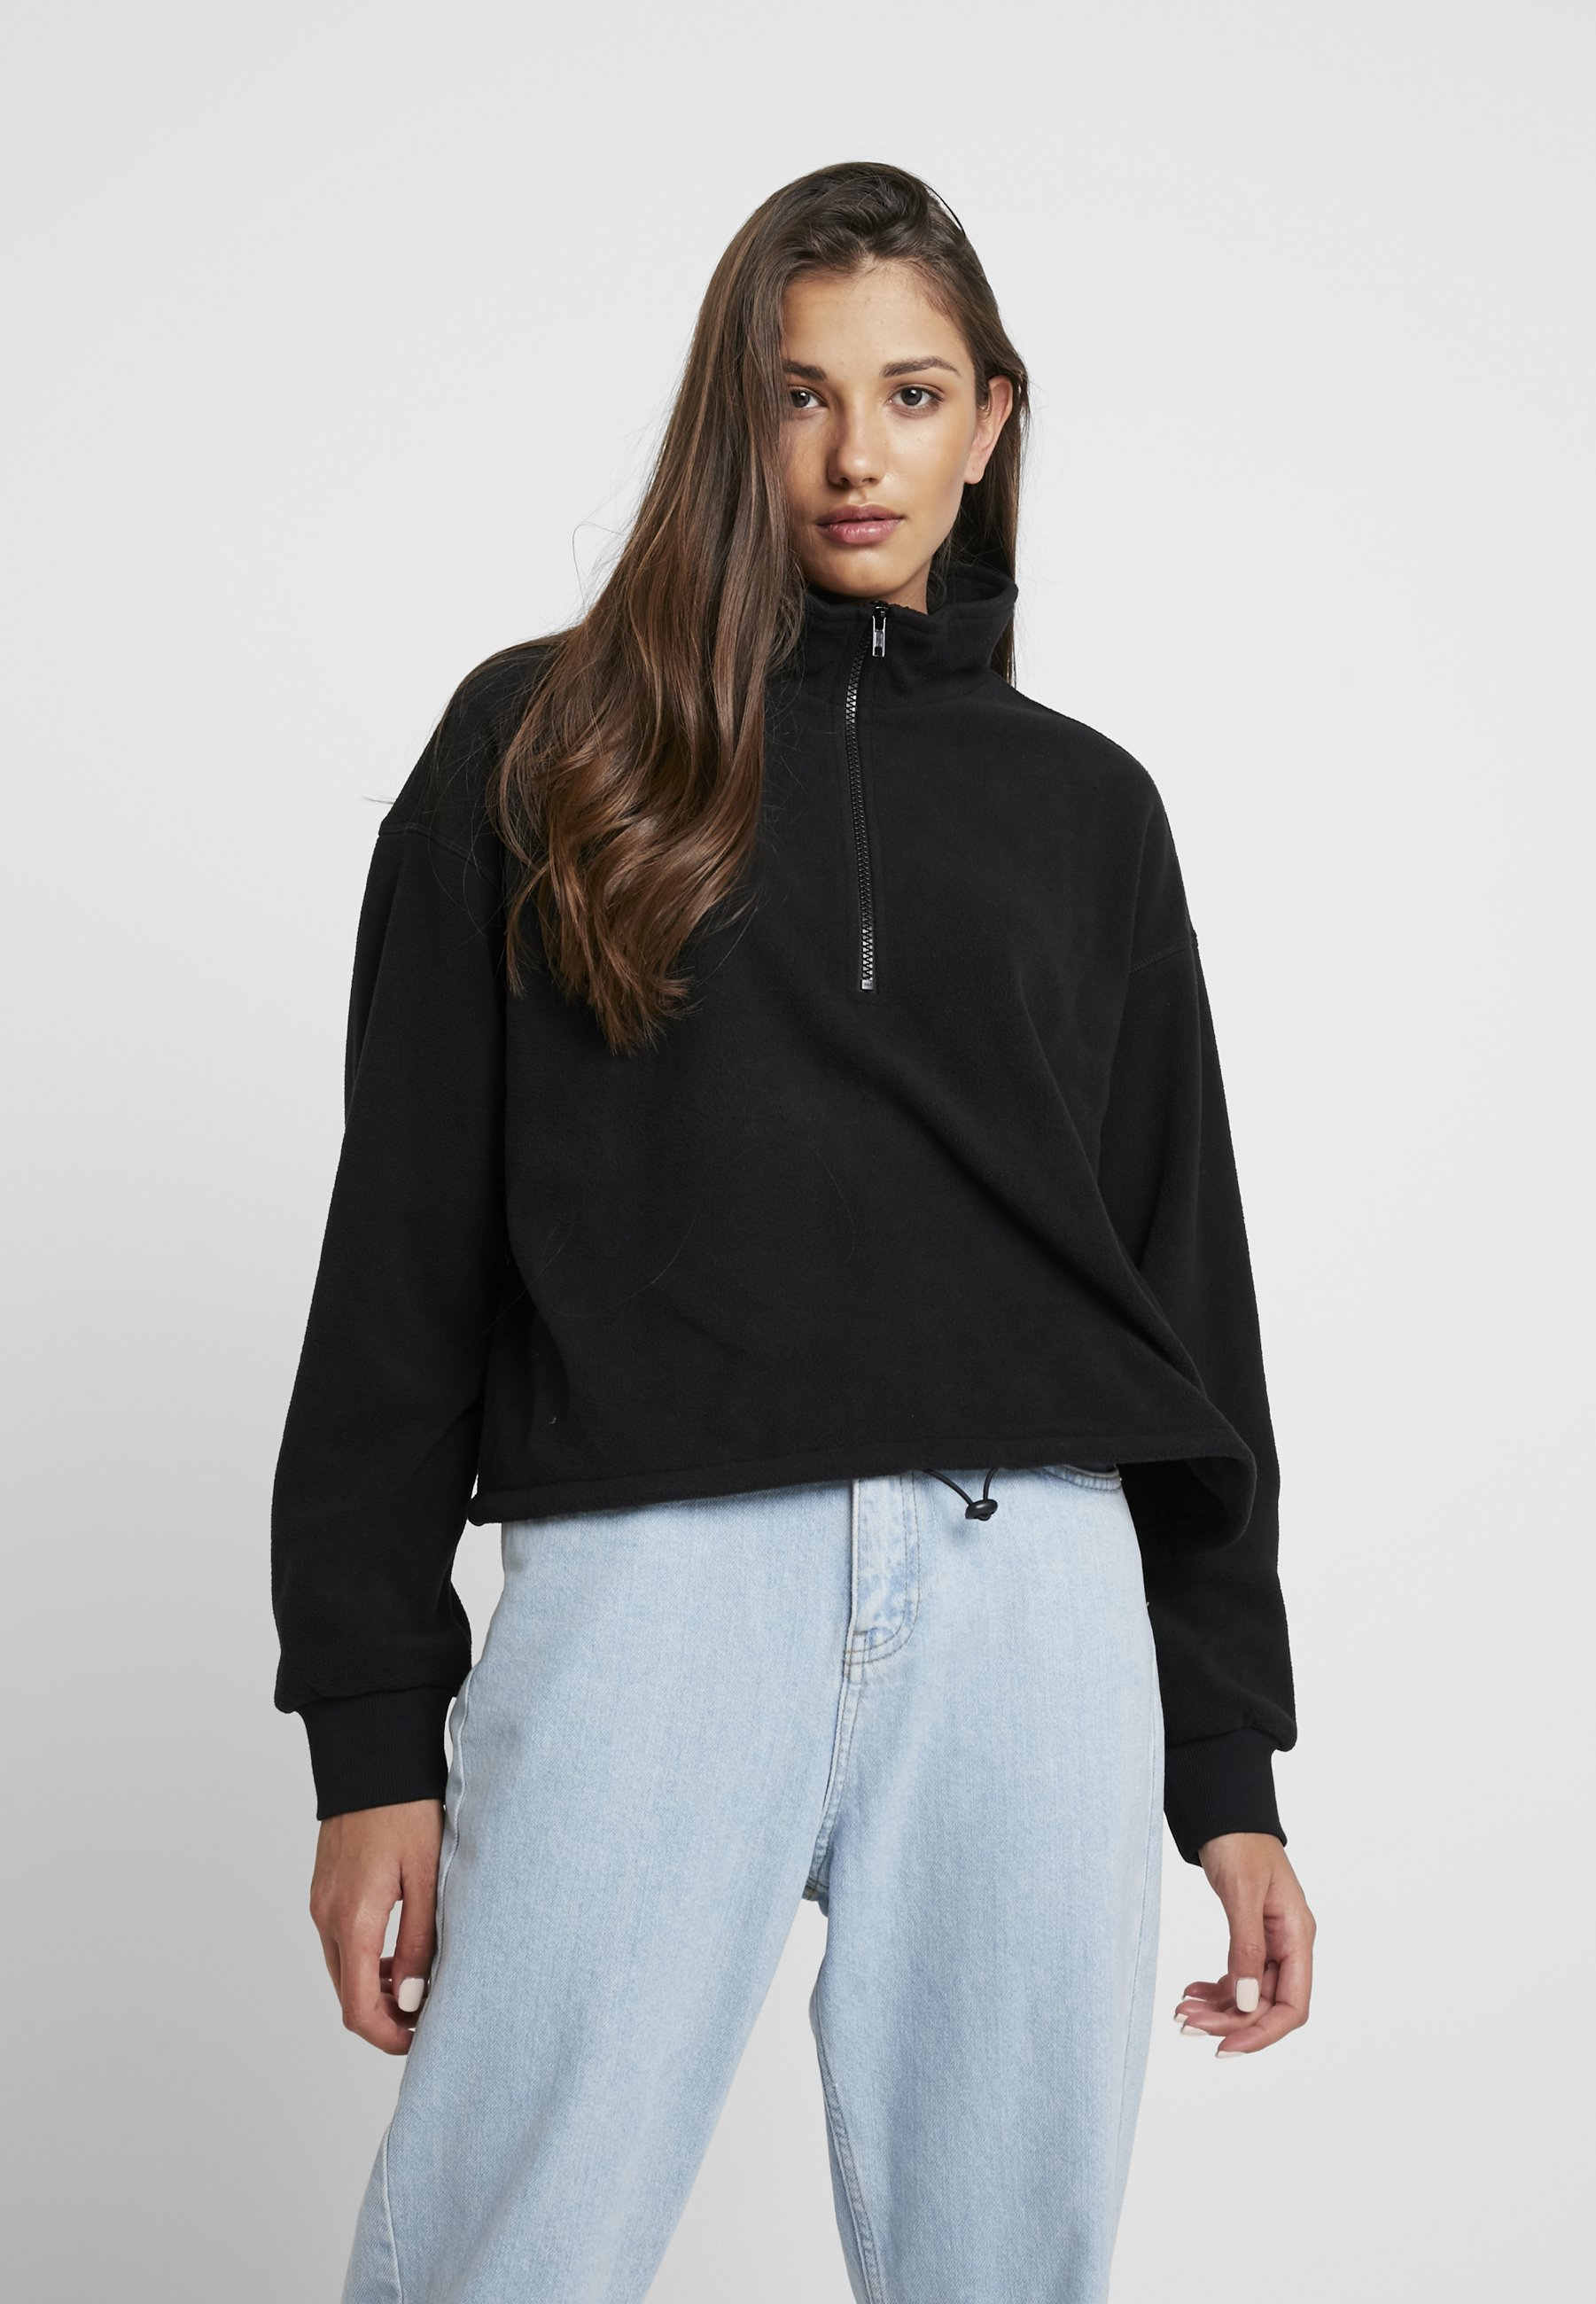 Monki Monki SummerSweatshirt SummerSweatshirt SummerSweatshirt Black Monki Black rdohtsQBCx